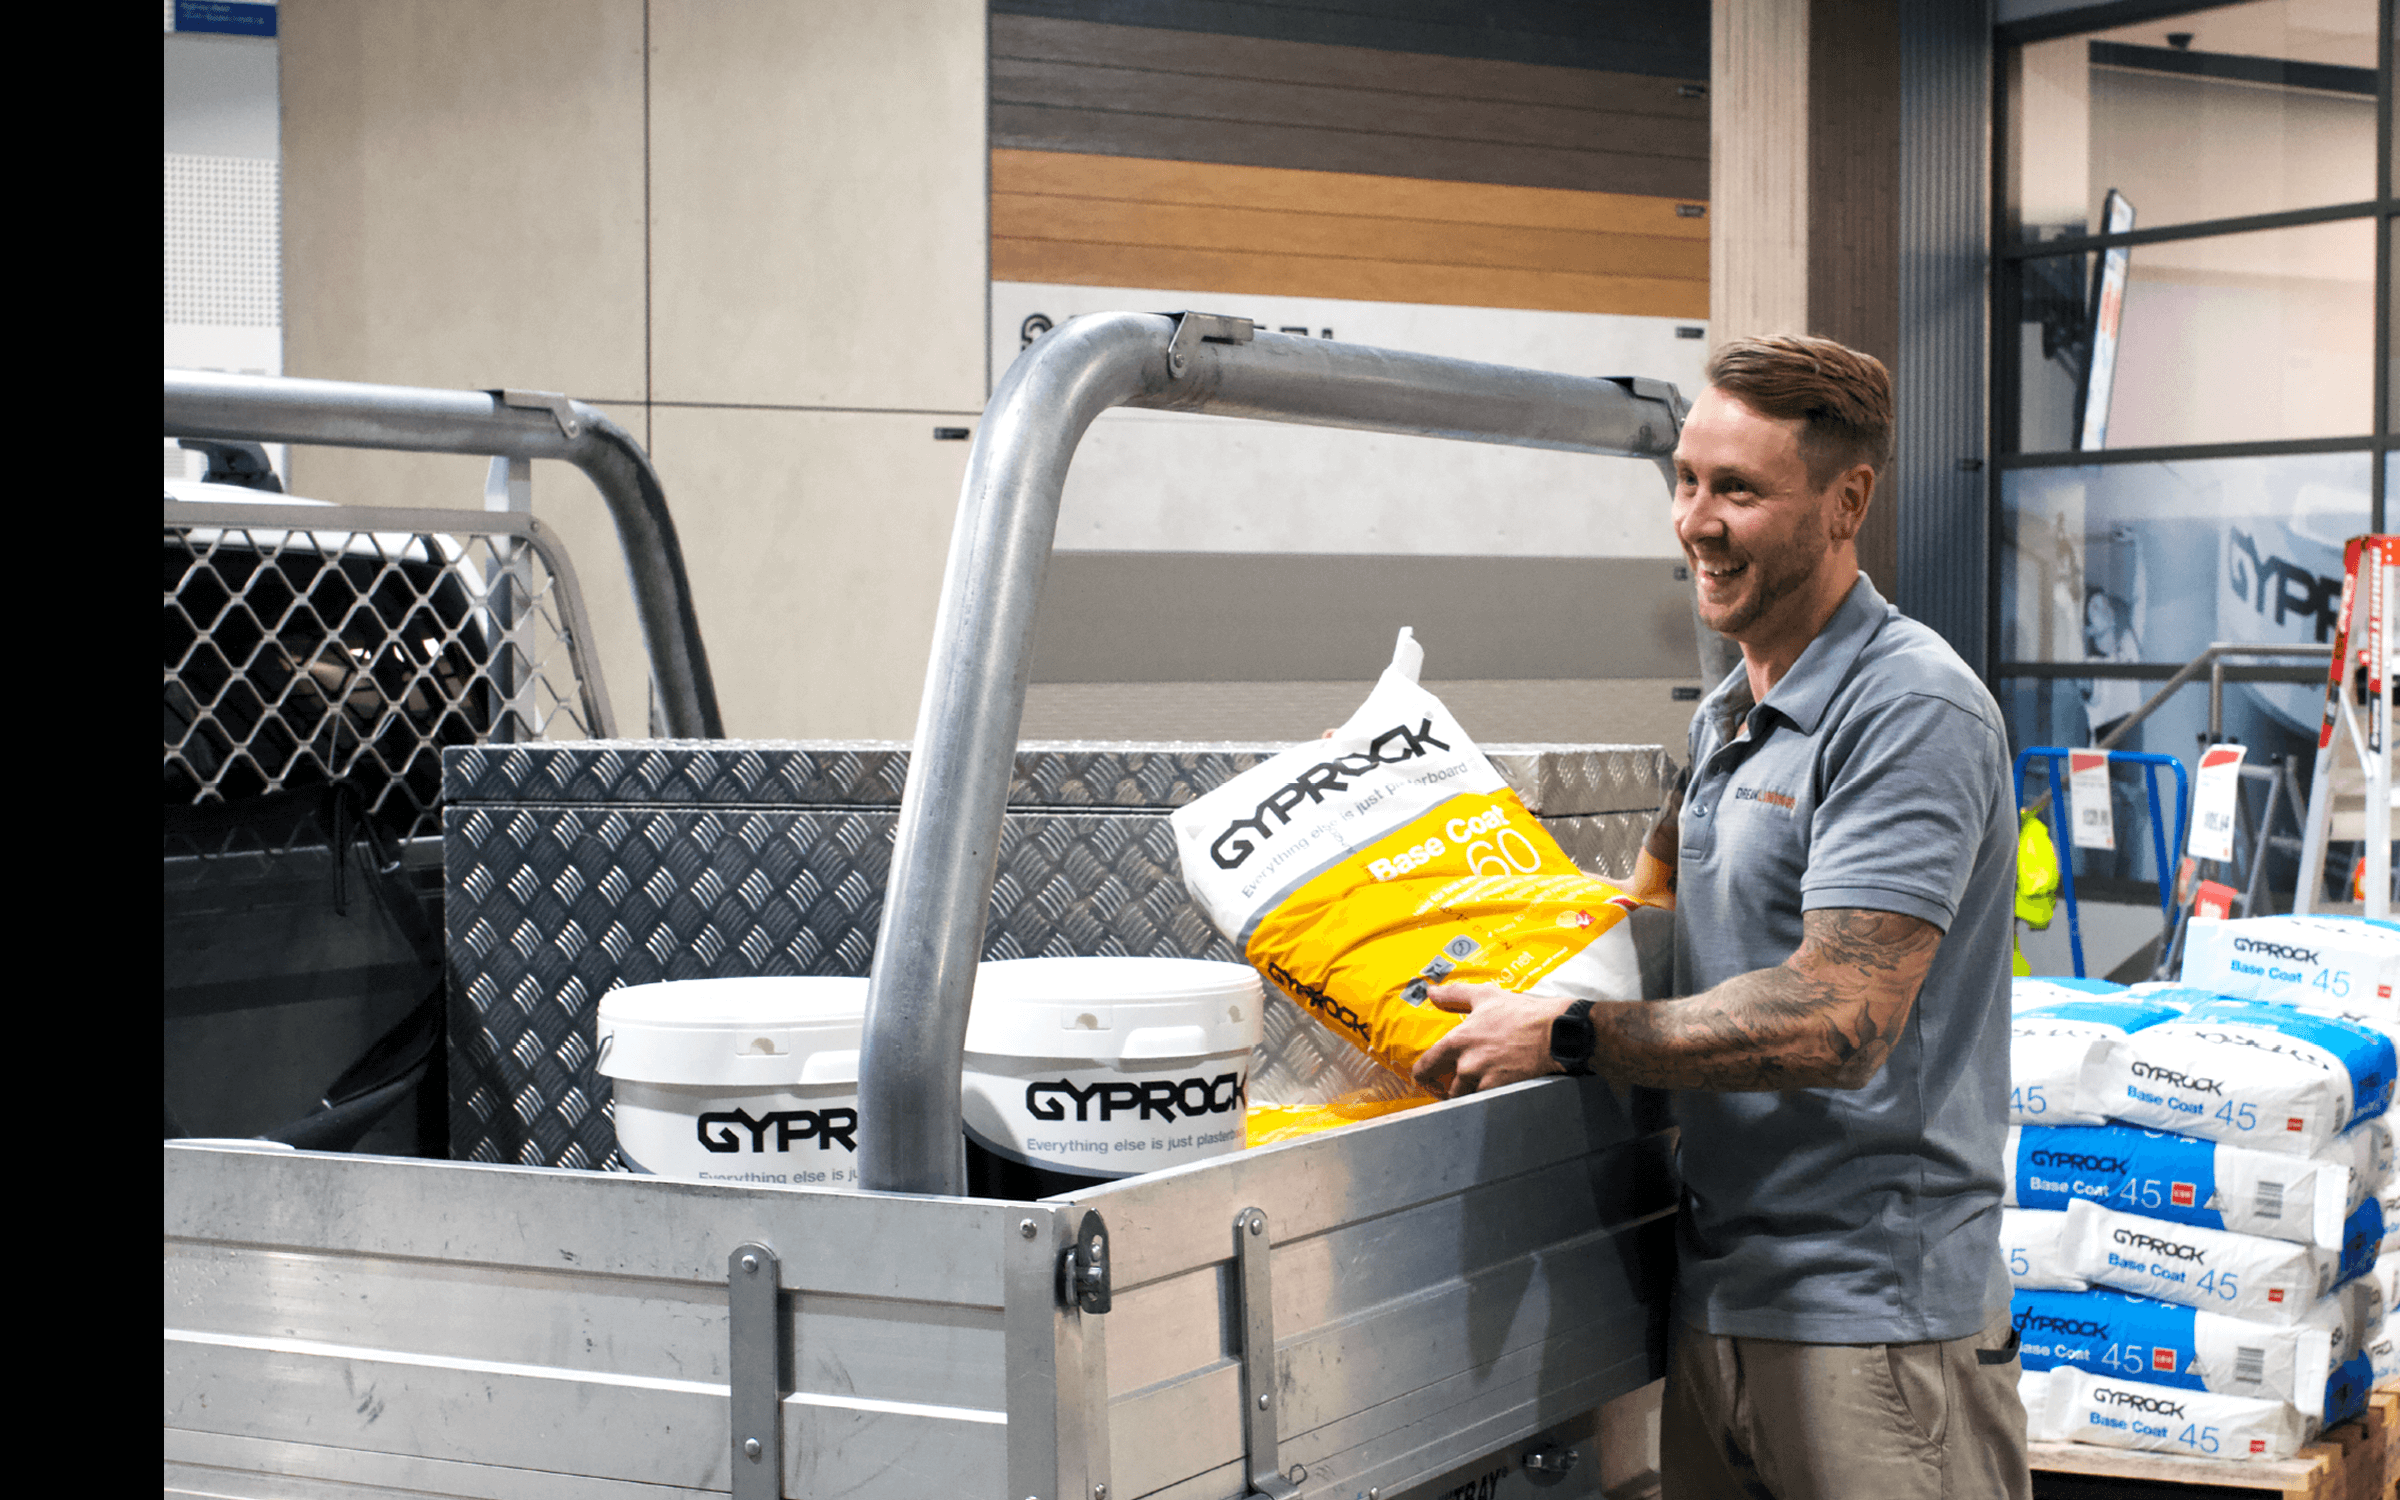 Gyprock | Australia's leading plaster products manufacturer